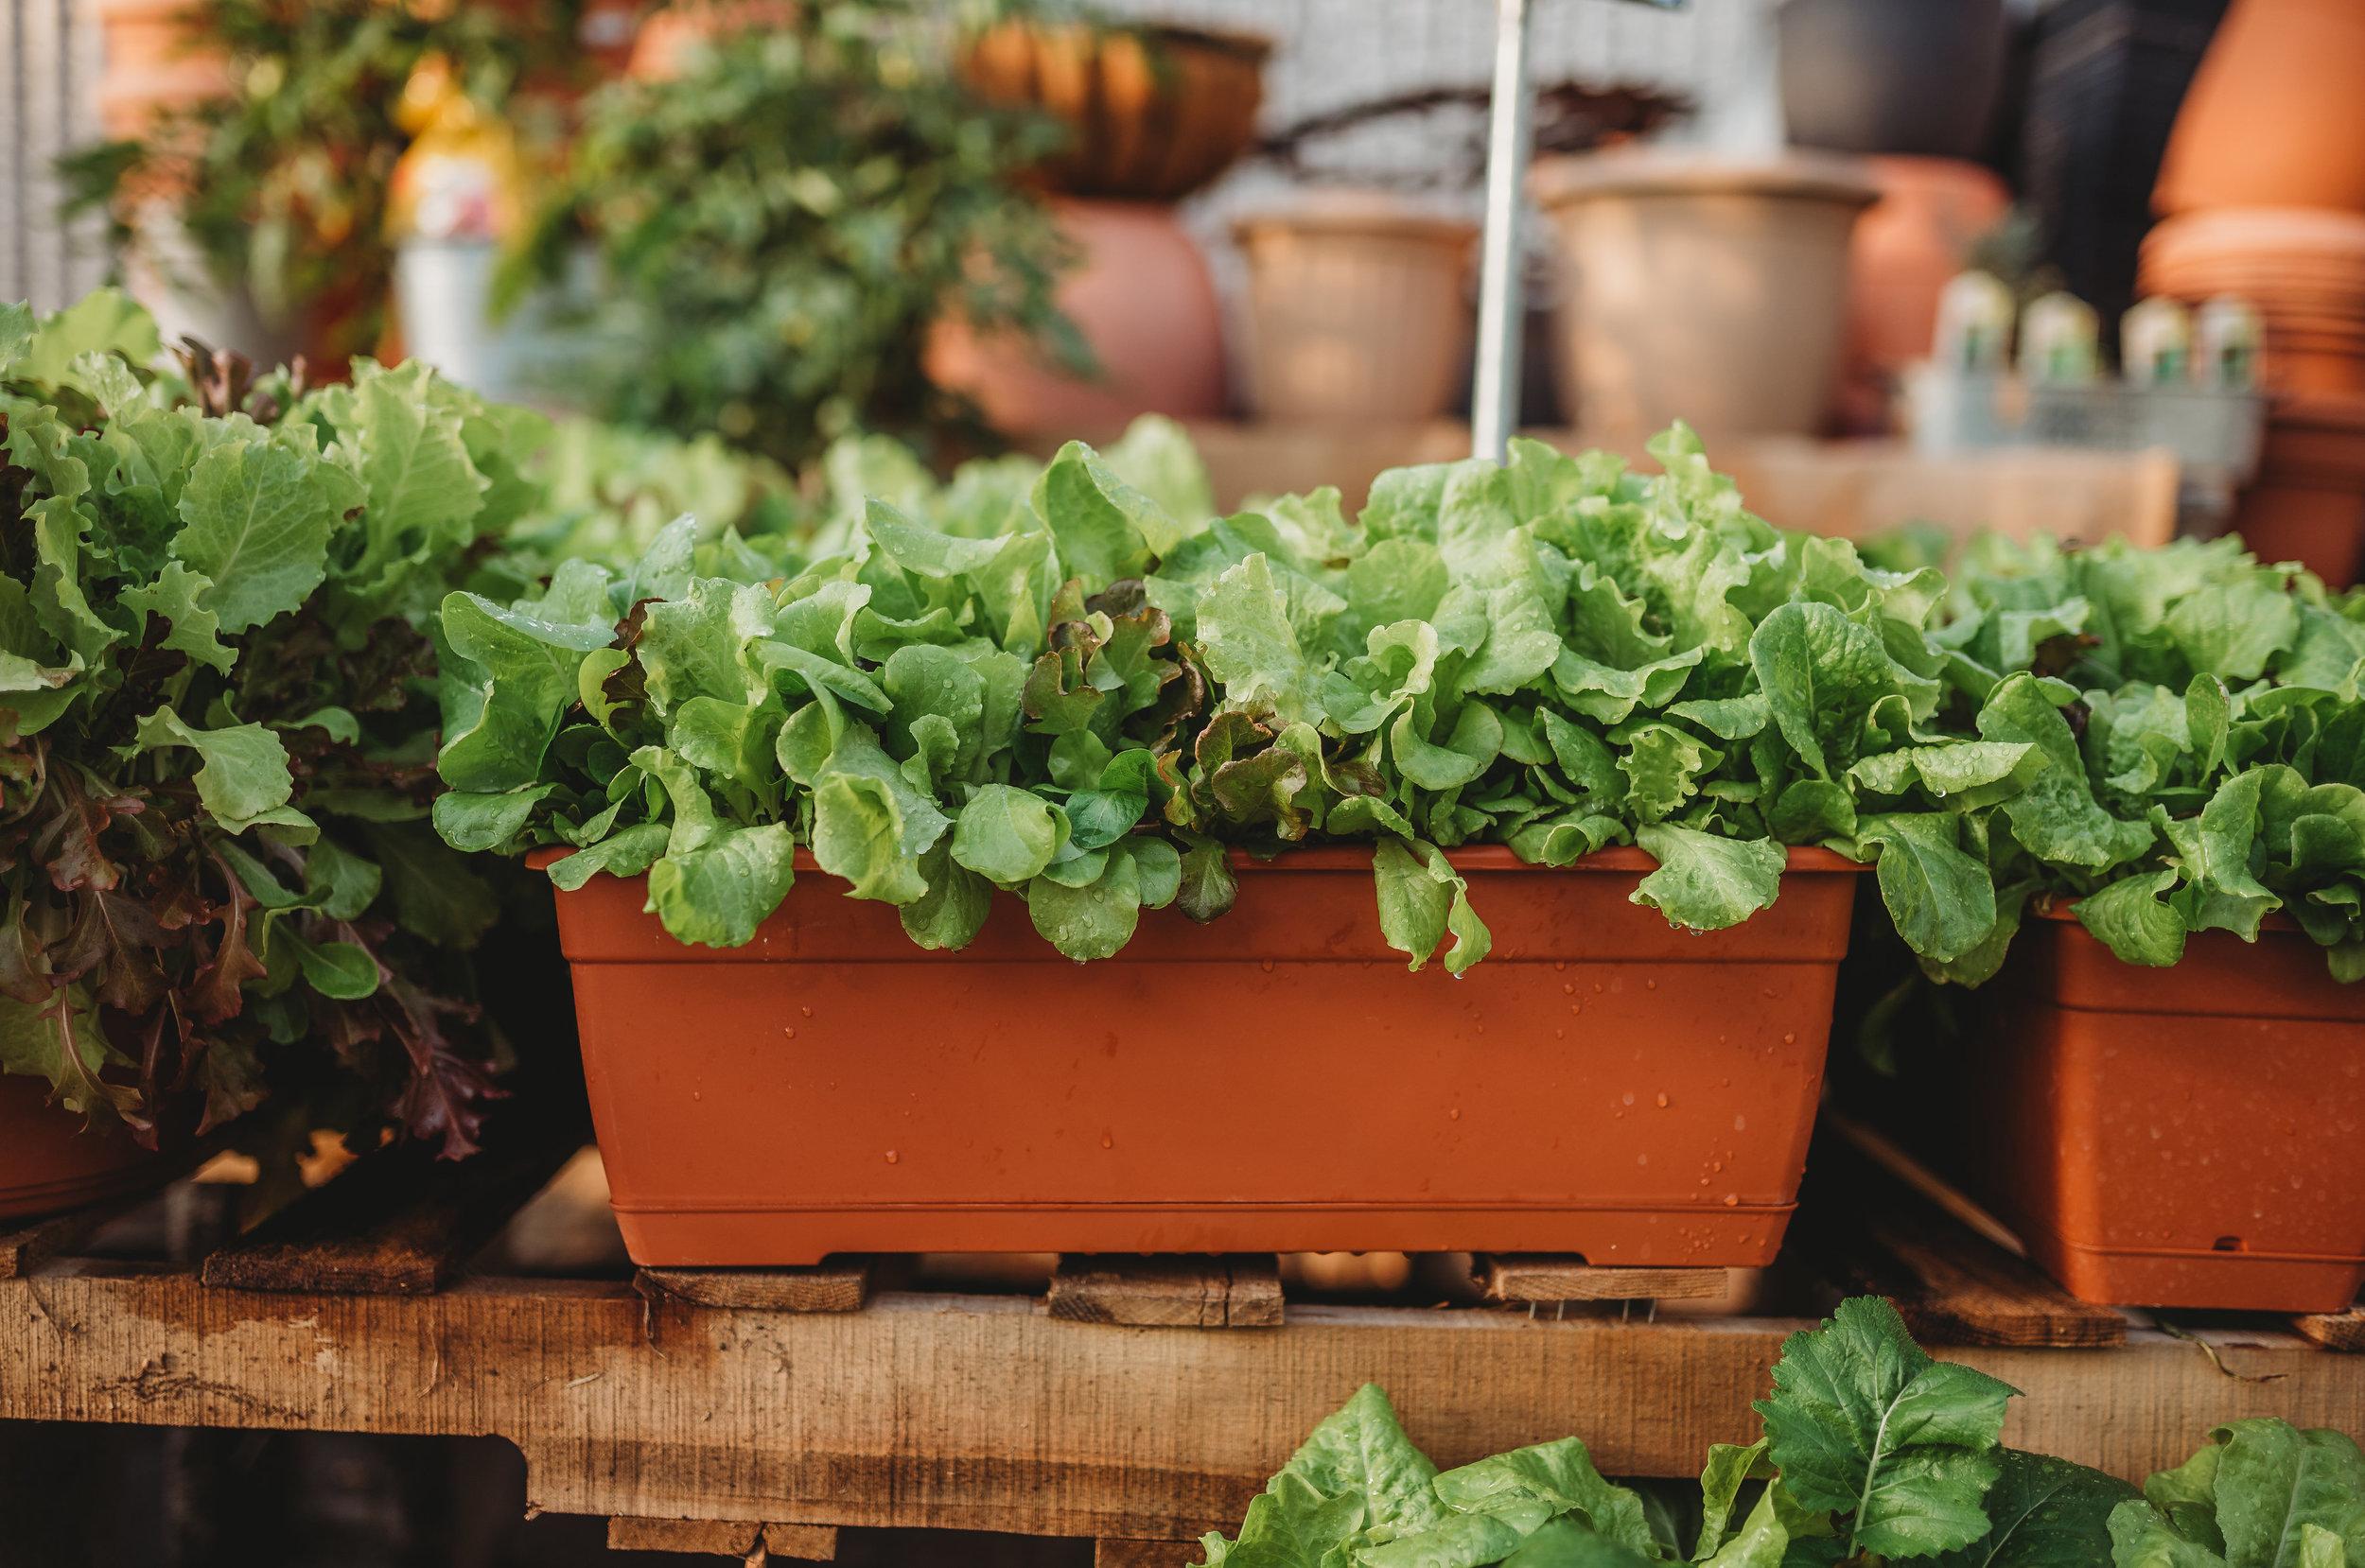 Lettuce Bowls - $10